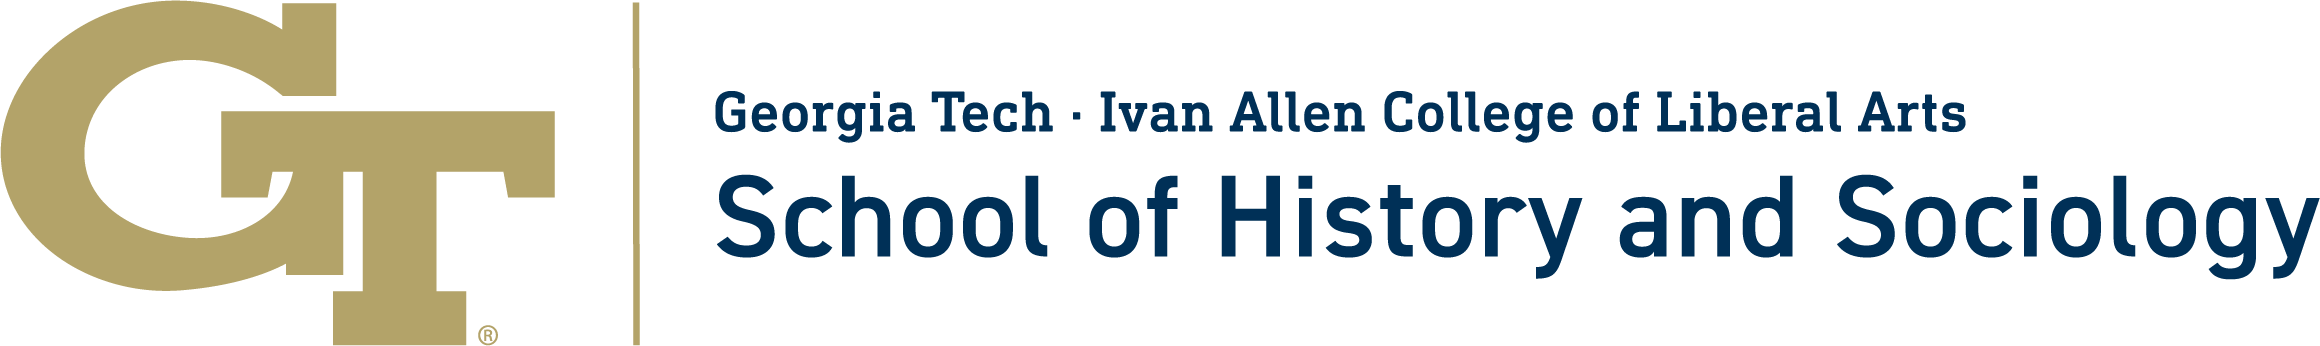 HSOC Ivan Allen GTGold RGB